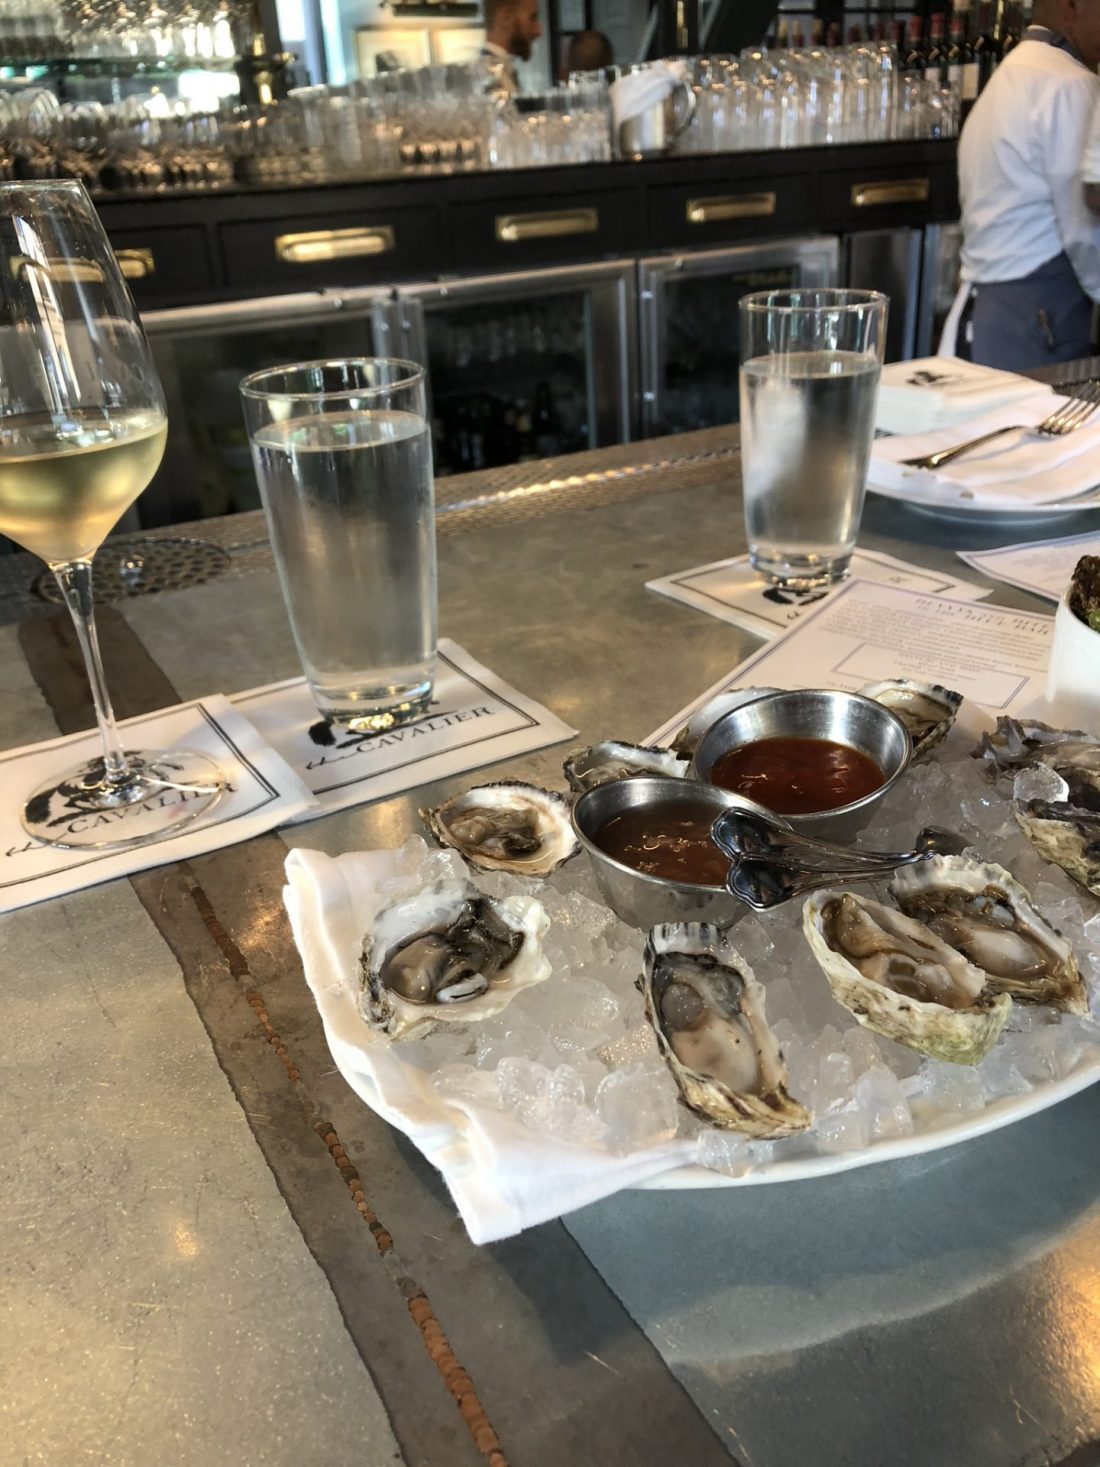 Oysters at Hotel Zetta, San Francisco